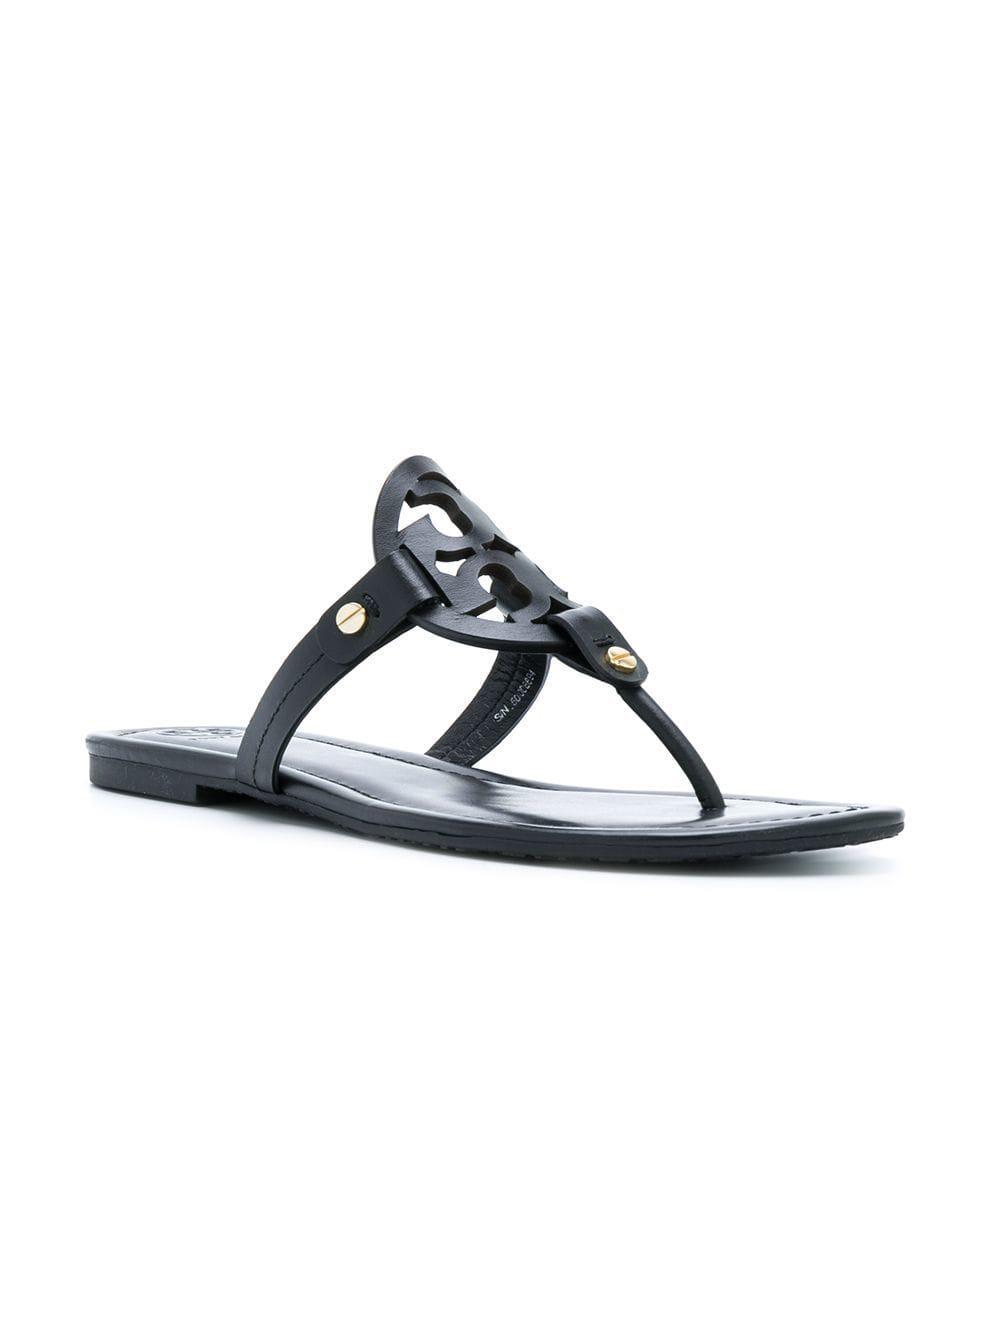 49a5ce5abb3 Tory Burch - Black Miller Leather Sandals - Lyst. View fullscreen